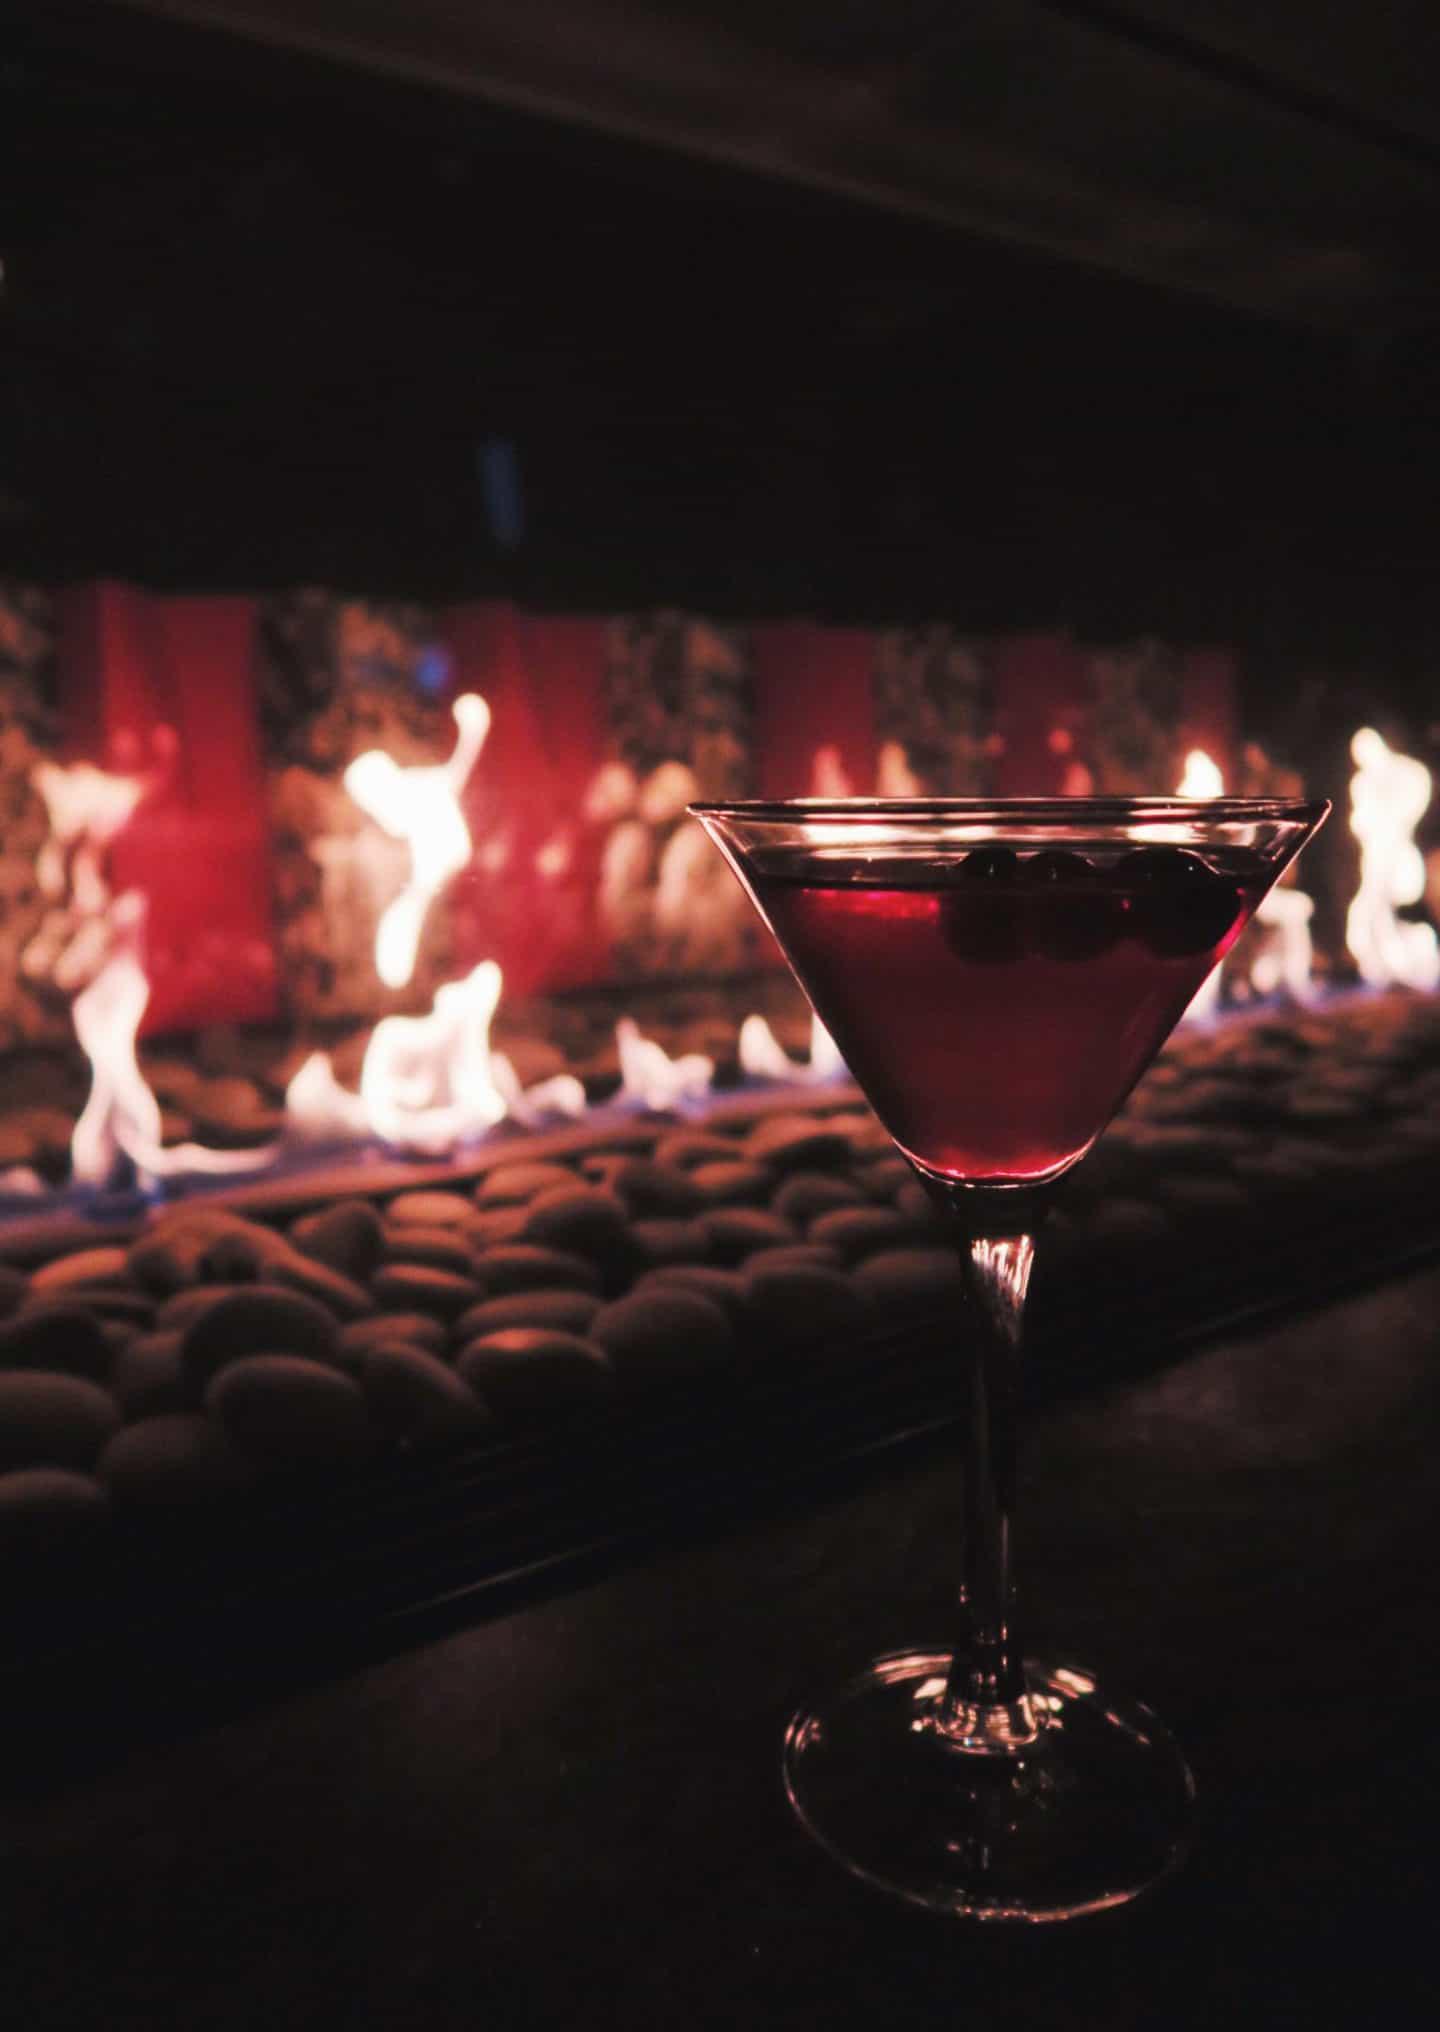 Cocktail at The Keg Steakhouse, Toronto